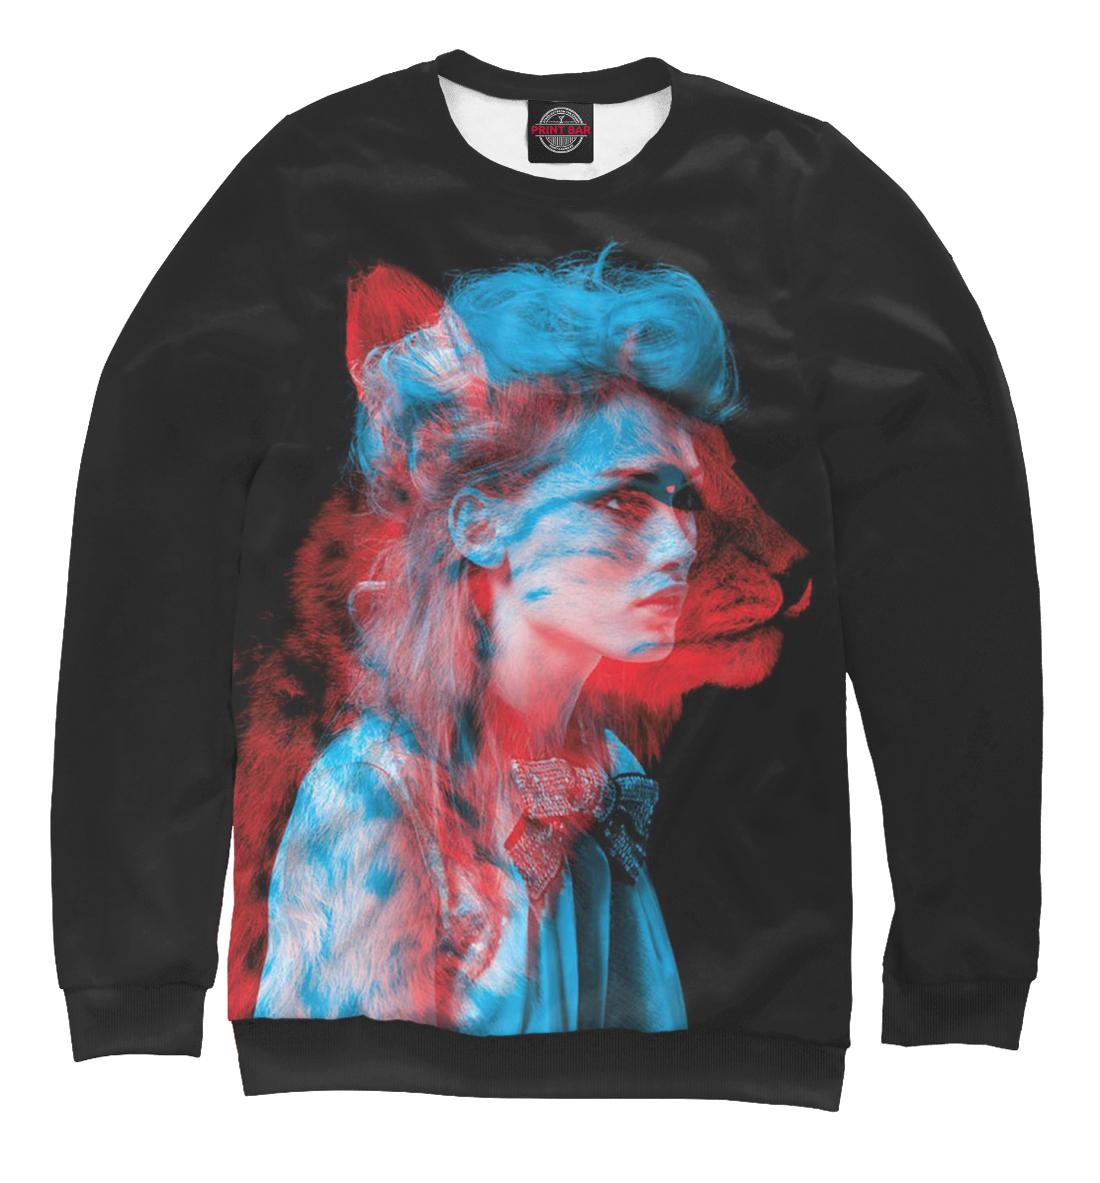 Купить Девушка кошка 3D, Printbar, Свитшоты, PSY-440621-swi-1